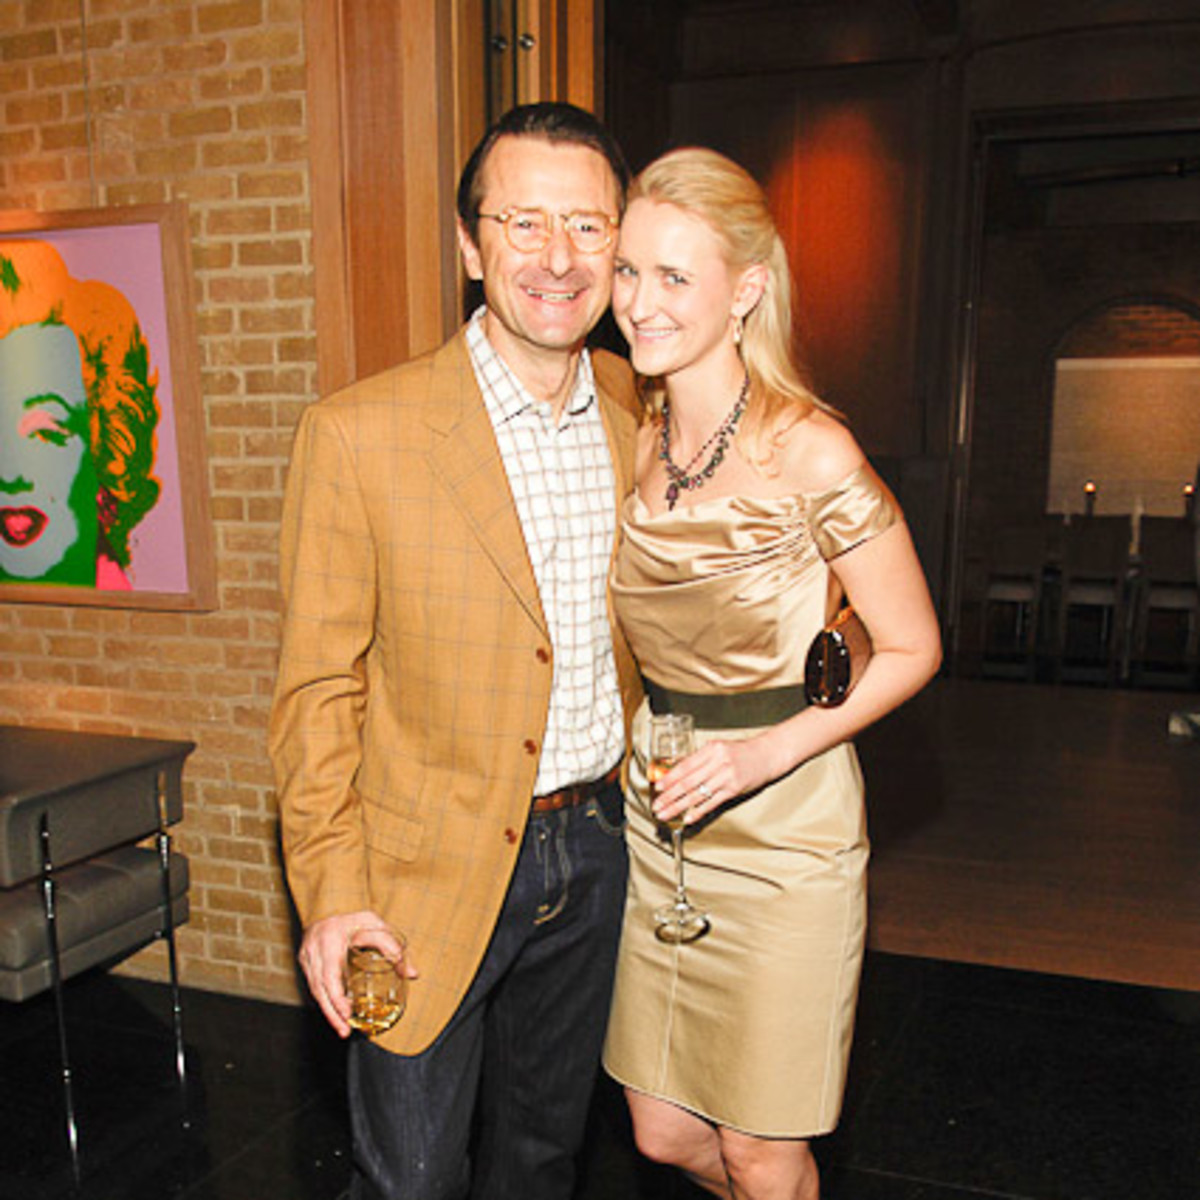 News_Vogue at Becca_Feb. 2010_Dan Dubrowski_Bevin Dubrowski